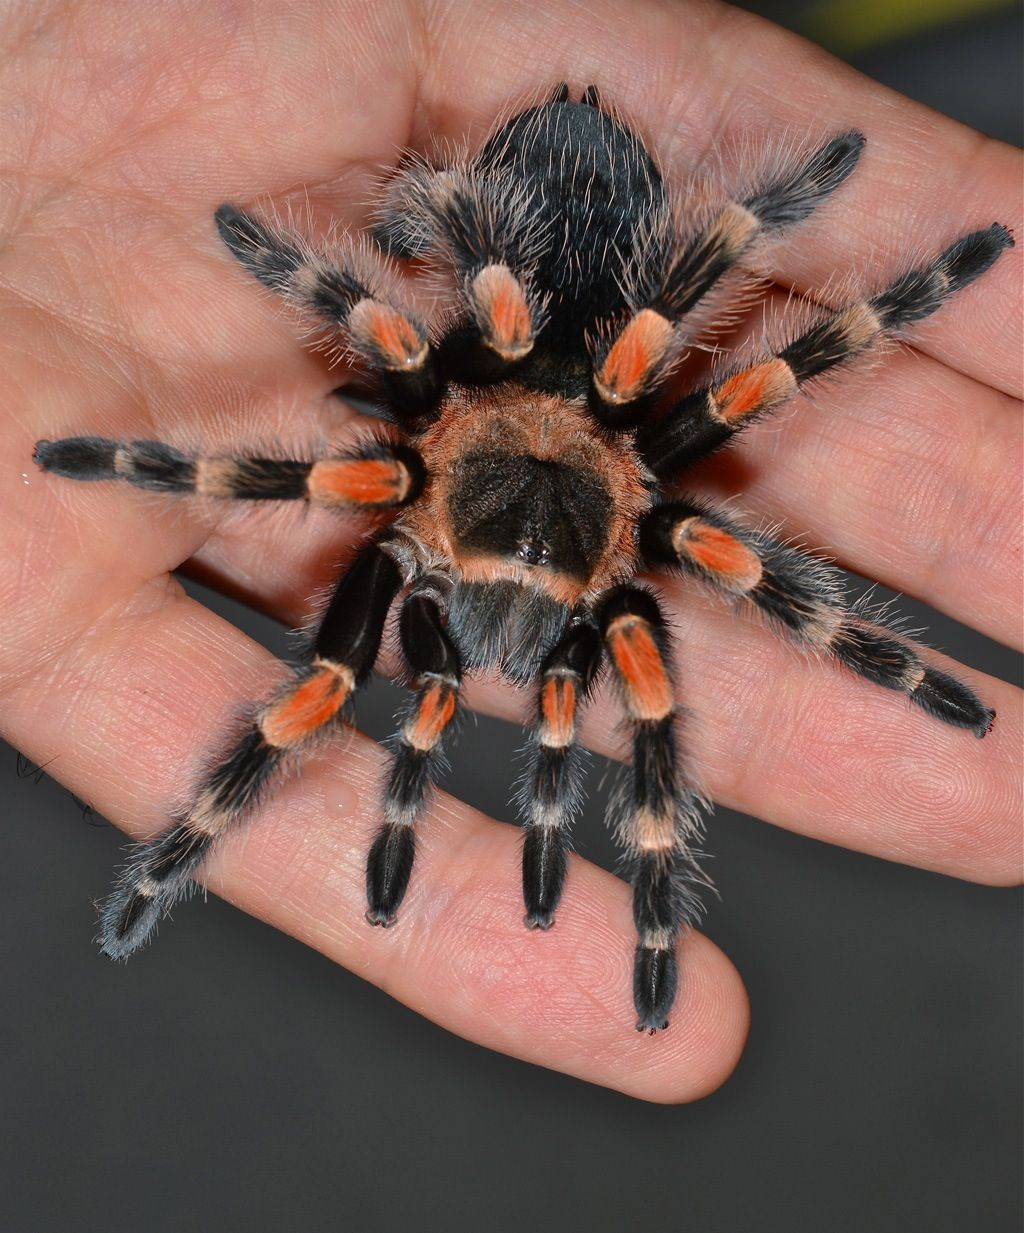 Mexican Red Knee Tarantula Pet tarantula, Pet spider